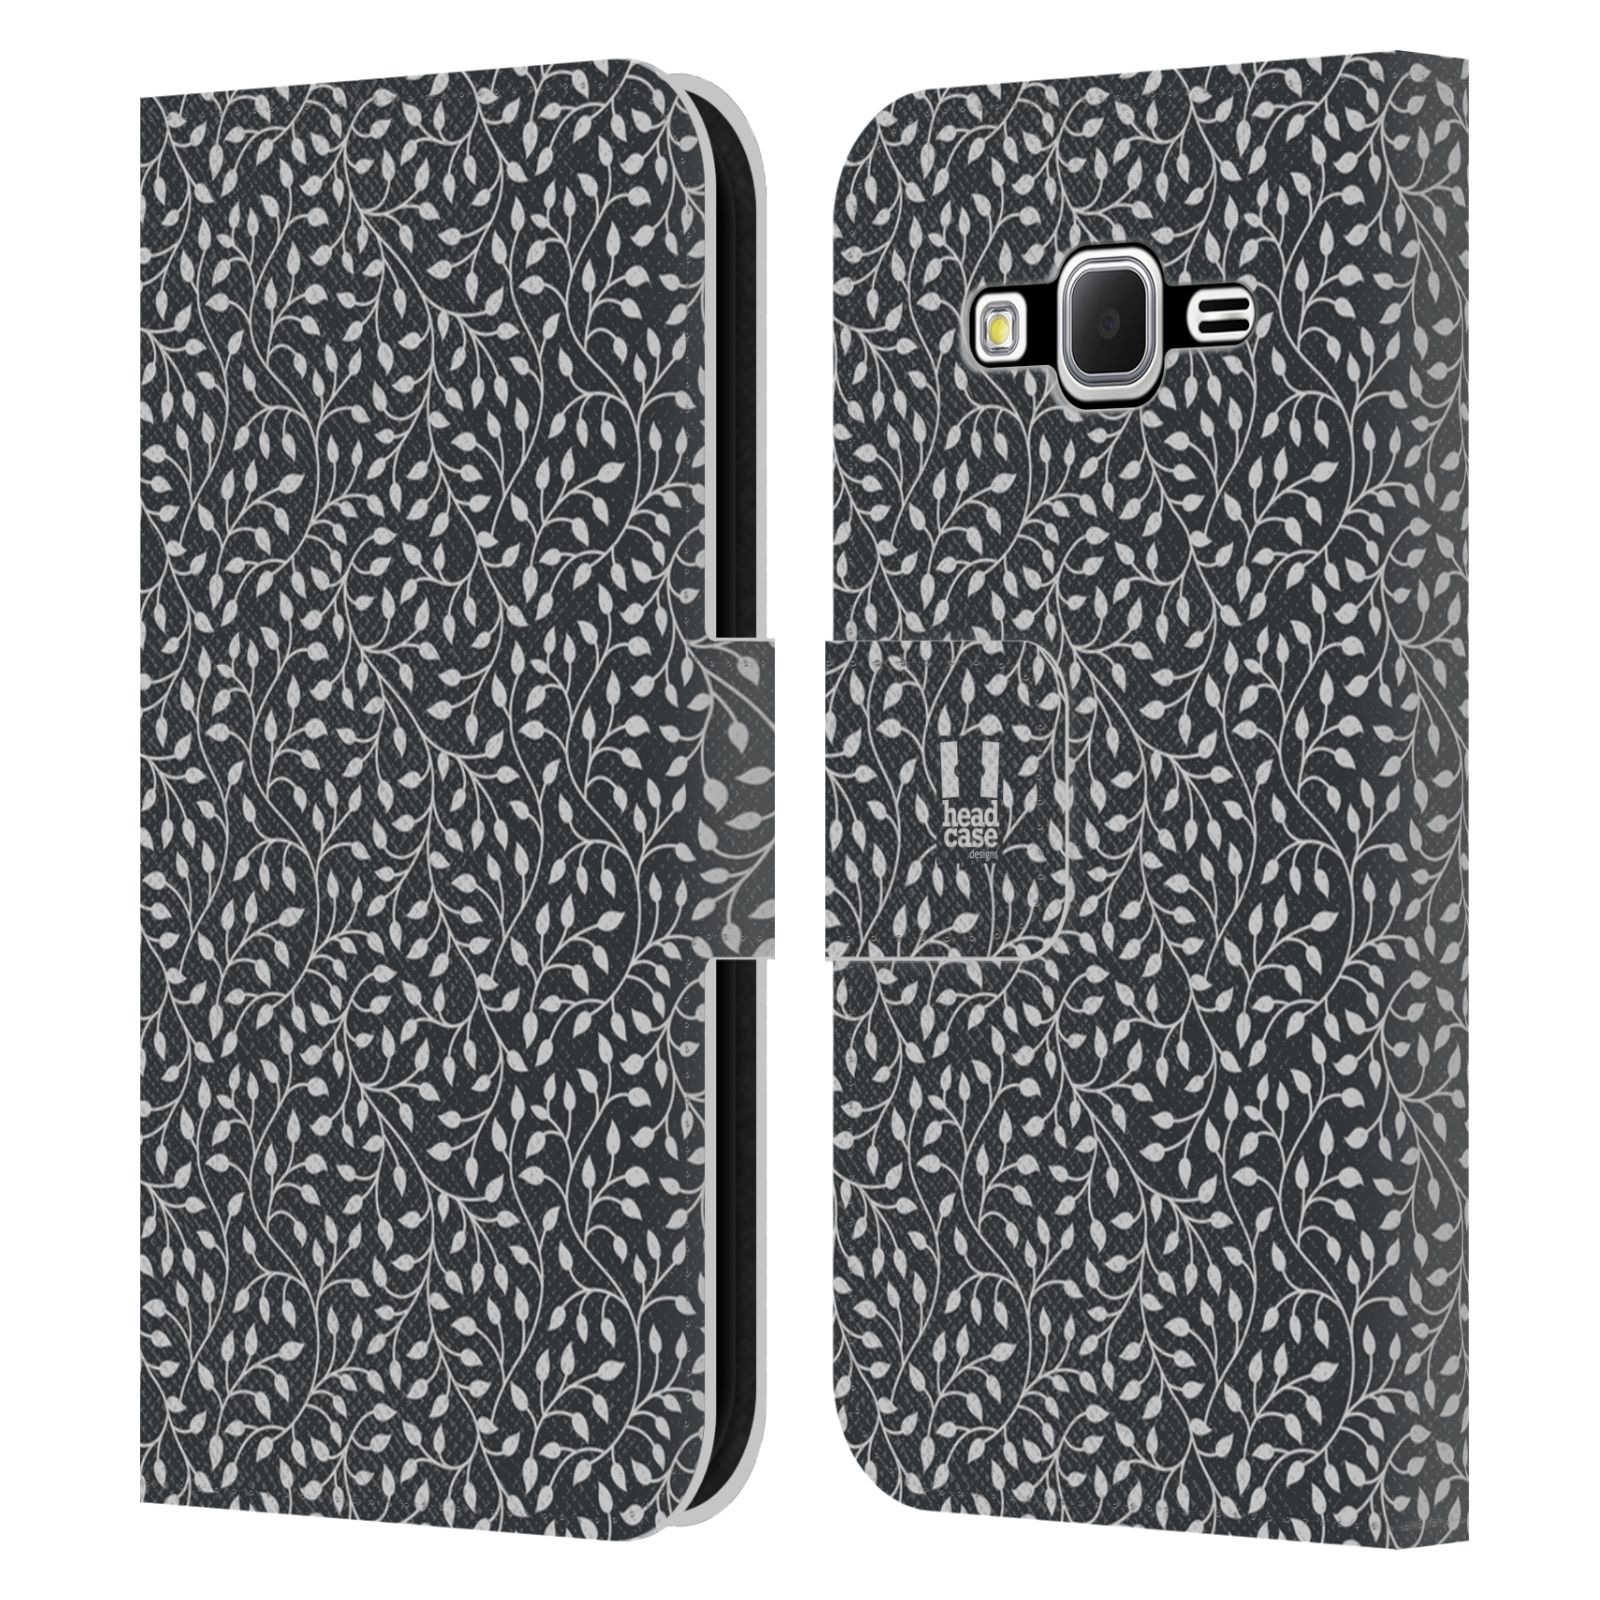 HEAD CASE Flipové pouzdro pro mobil Samsung Galaxy CORE PRIME vzory listy tmavá